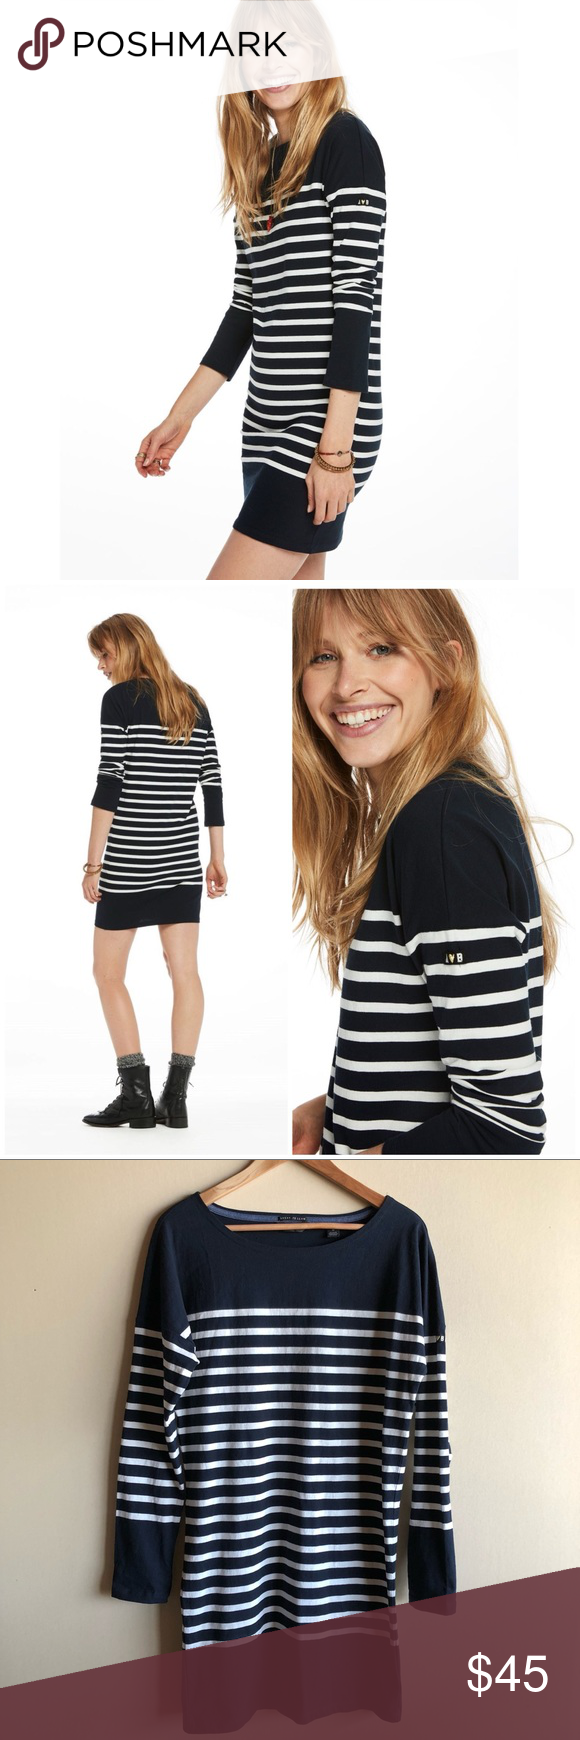 Scotch u soda breton striped long sleeve dress